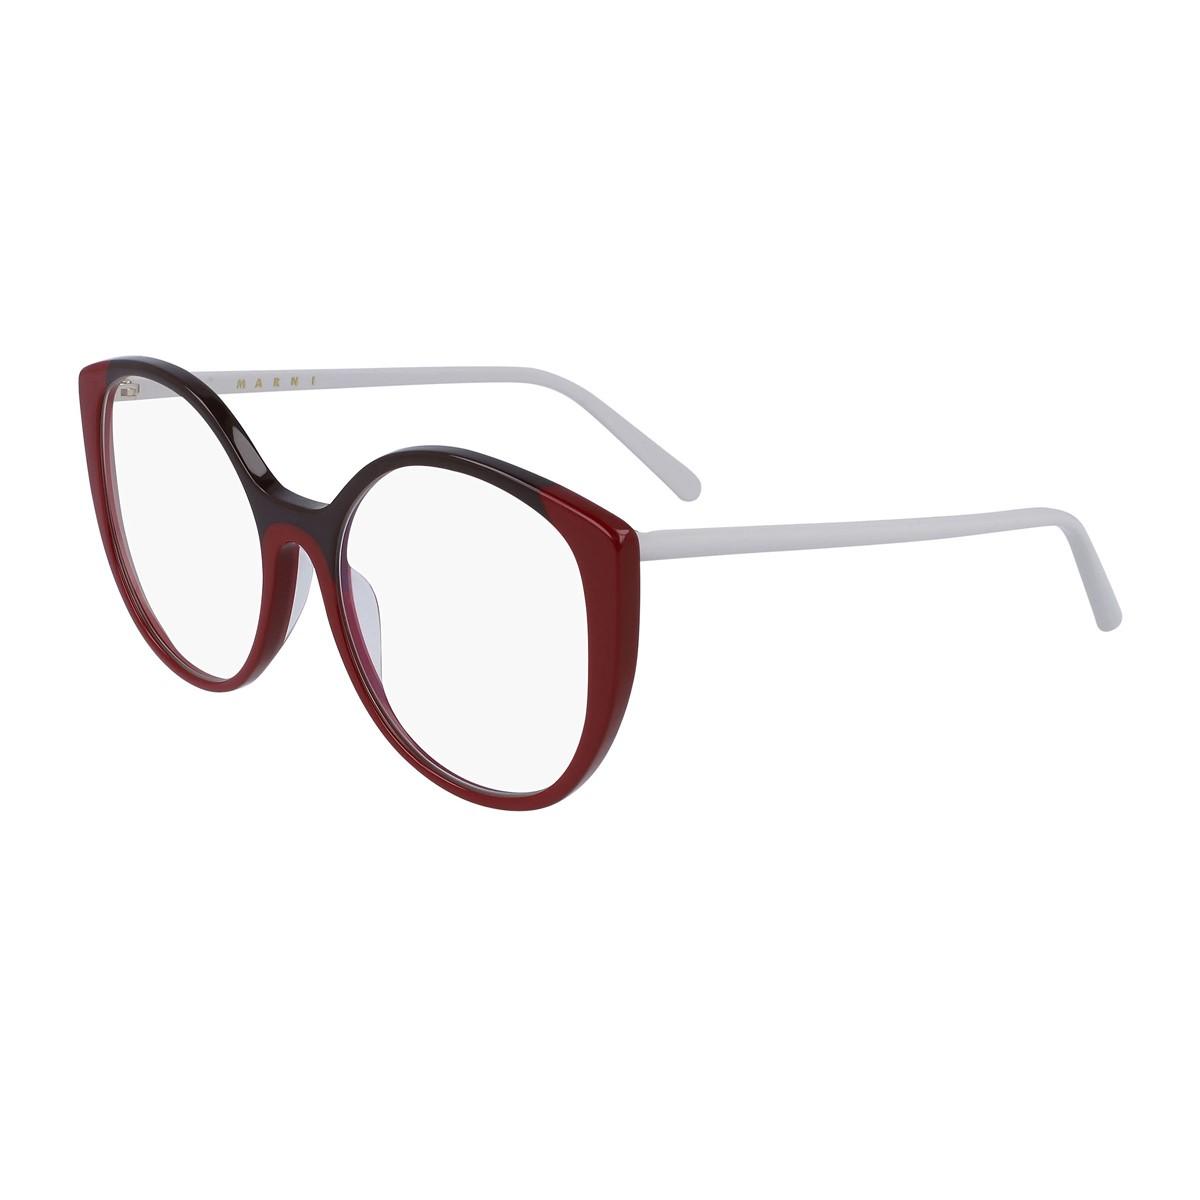 Marni ME2637 | Women's eyeglasses